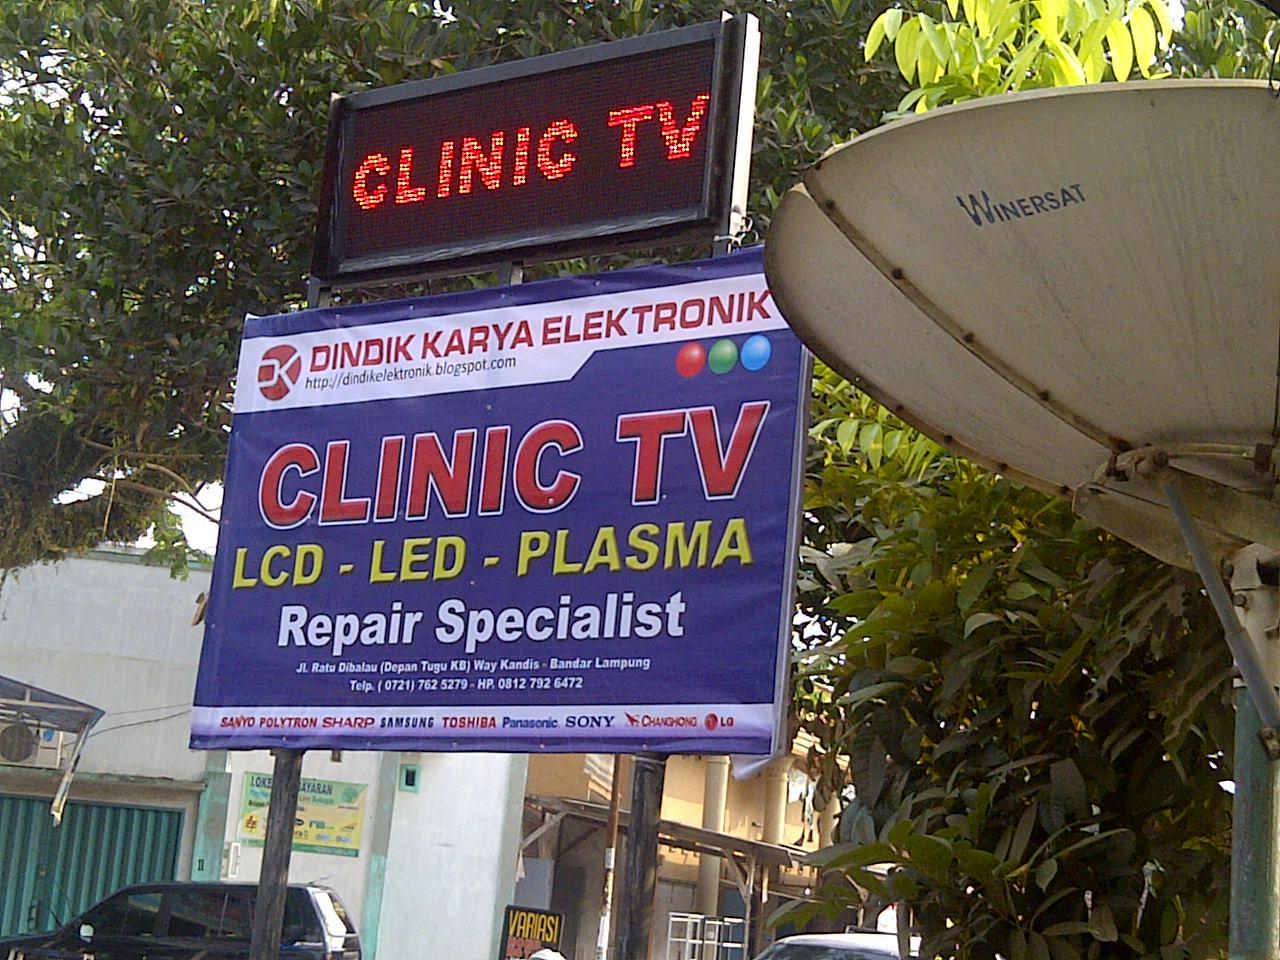 CLINIC TV LCD LED LAMPUNG SERVICE TV LCD LED PLASMA